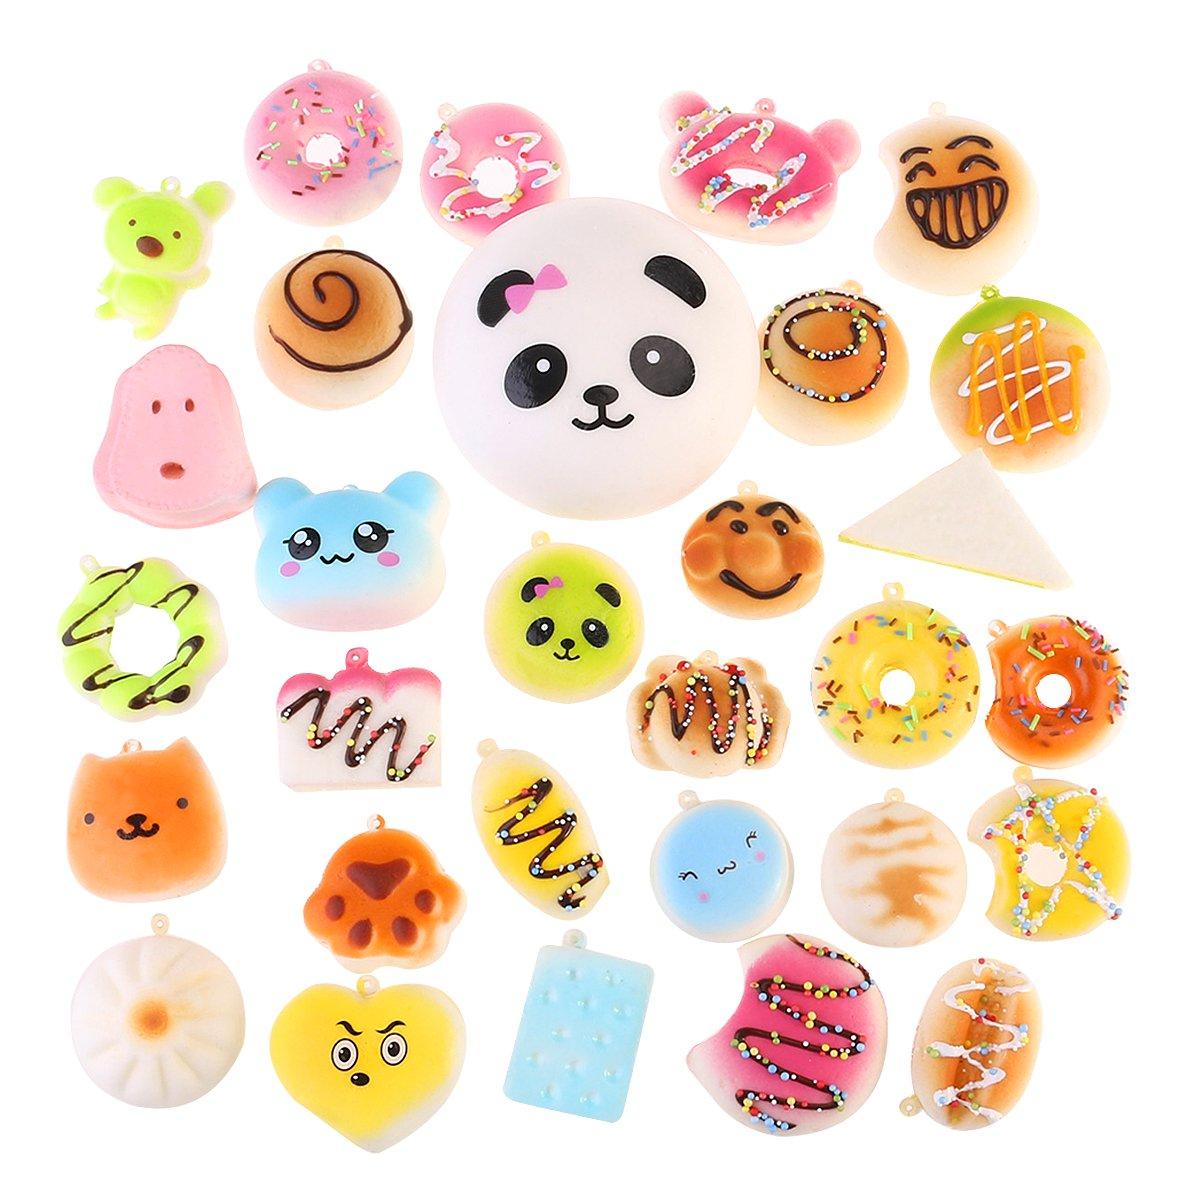 NUOLUX 30Pcs Jumbo Medium Mini Random Squishy Soft Panda/Bread/Ca ke/Buns Phone Straps